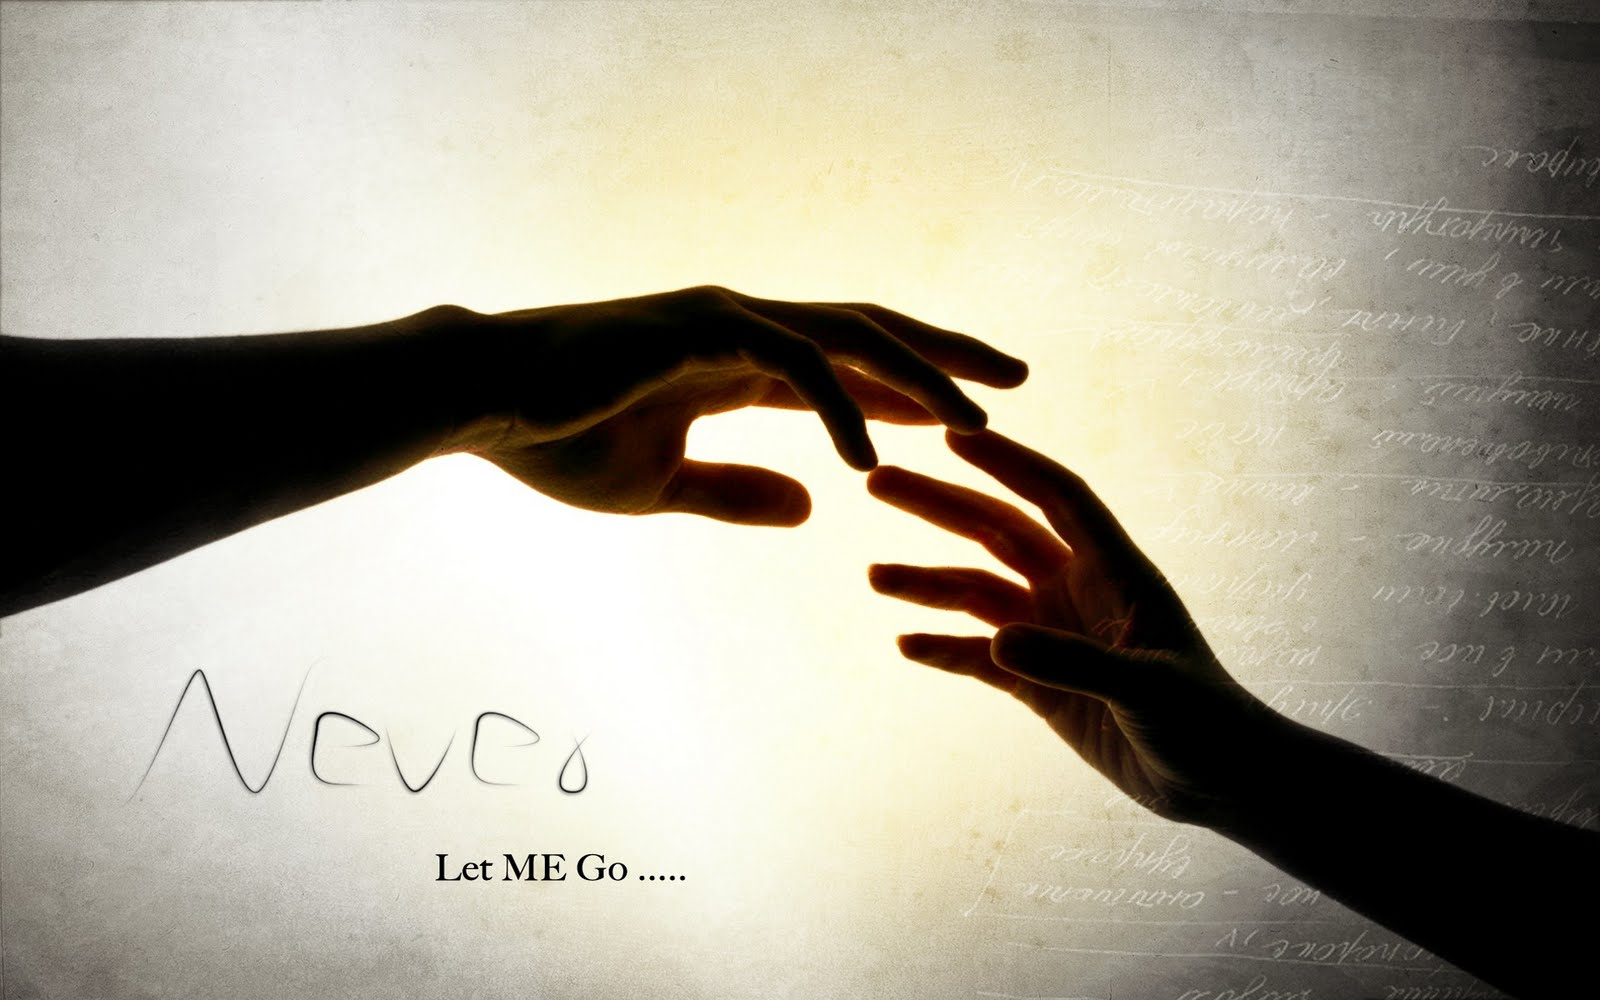 http://1.bp.blogspot.com/-qjgLhcoxaNQ/Tp0JwgGFhwI/AAAAAAAAAnQ/qW_vafWet1A/s1600/Never+Let+Me+Go+...+HD+Wallpaper+-+LoveWallpapers4u.Blogspot.Com.jpg